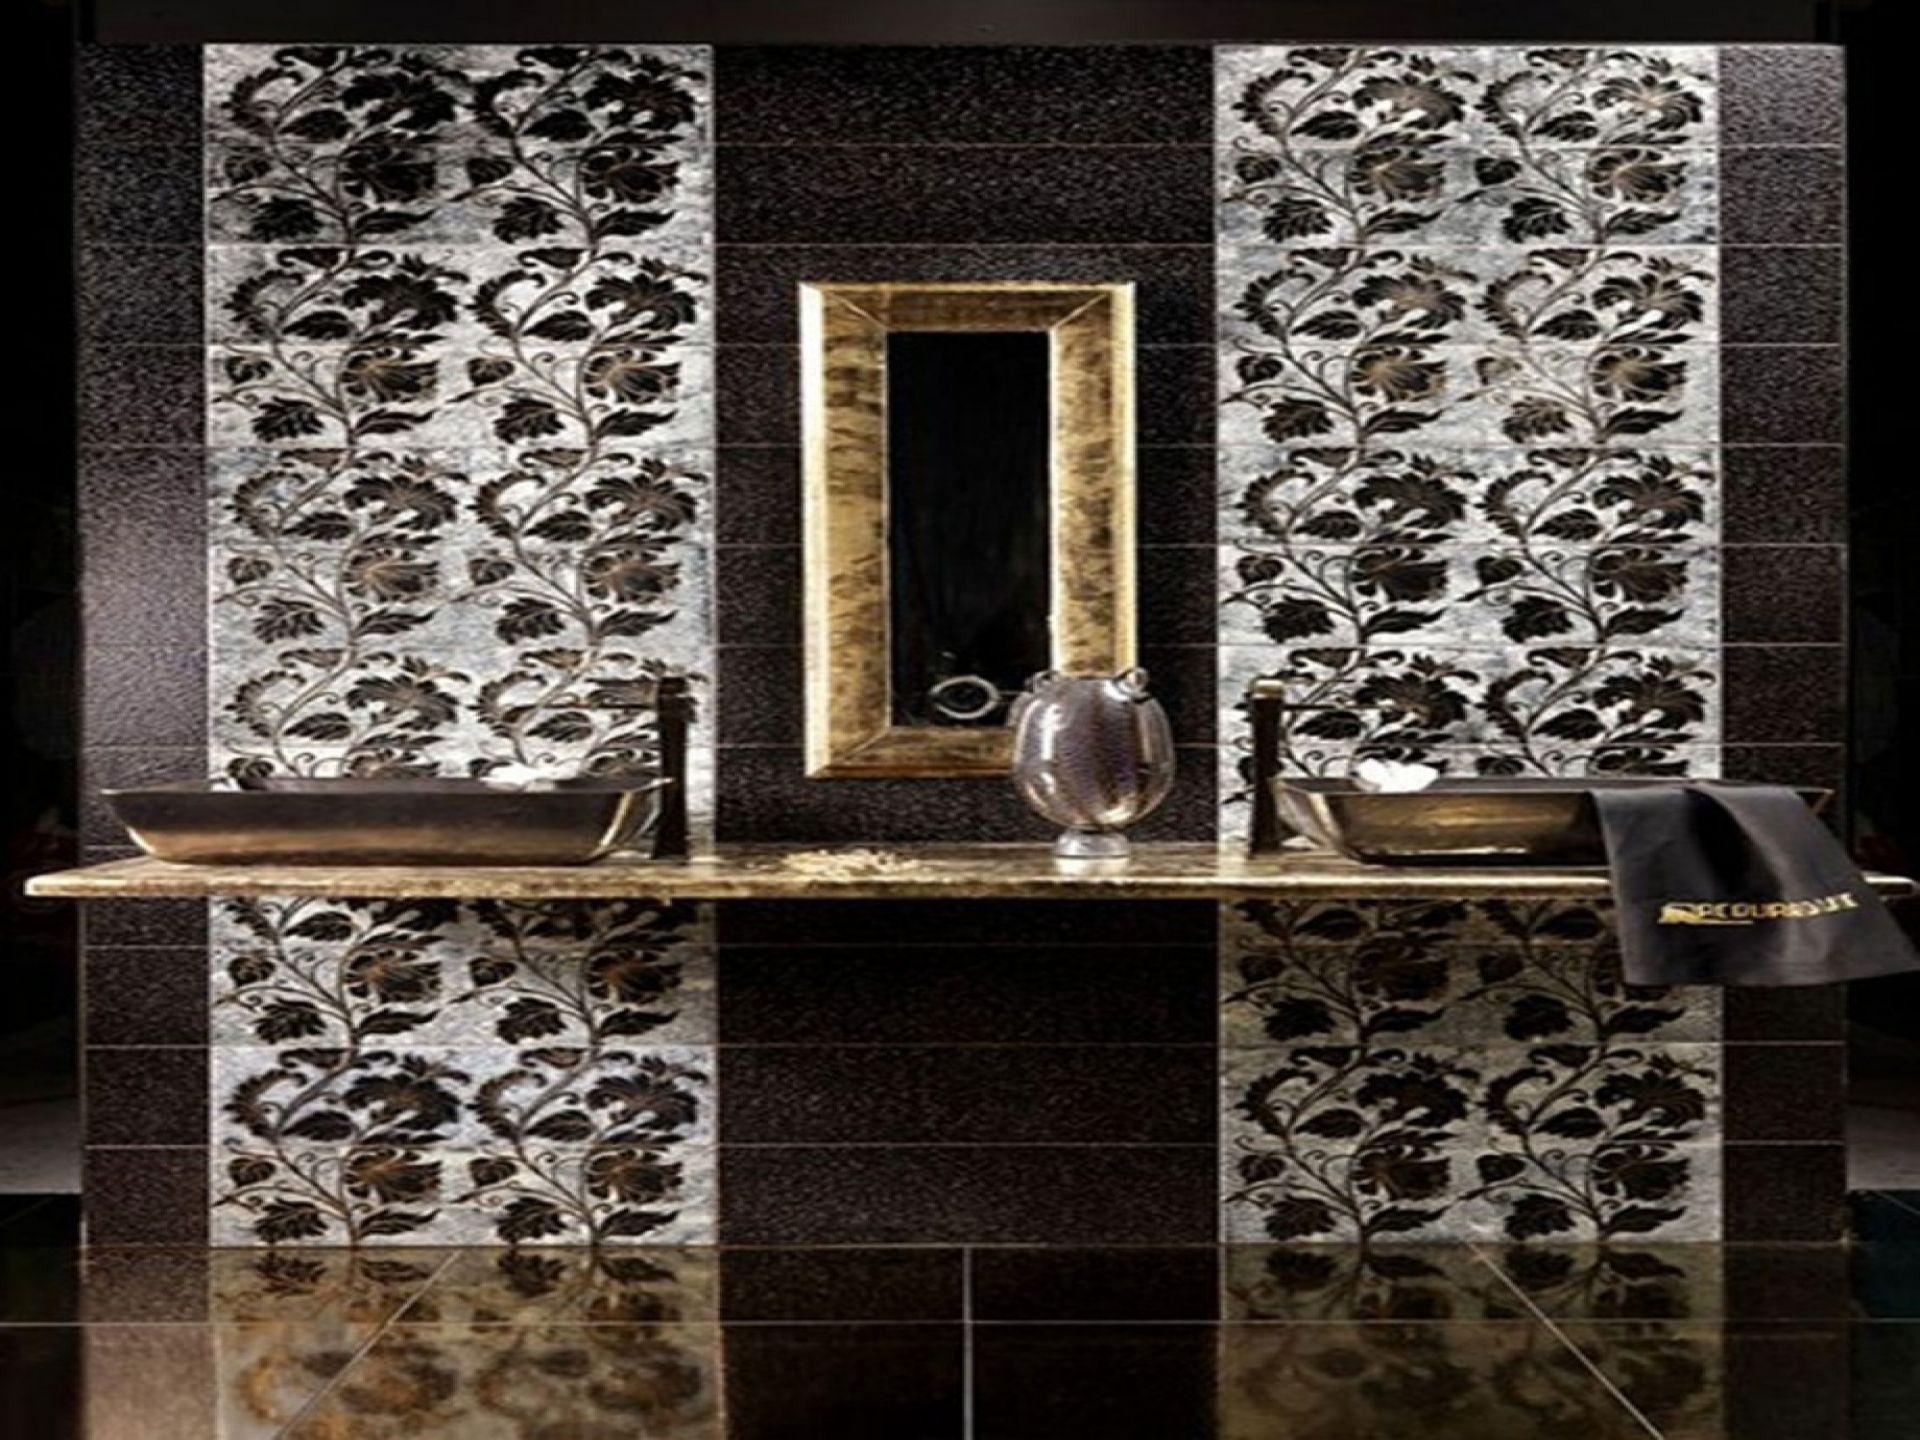 Mosaic Bathroom Tile Designs Decorating Ideas With Floral ... on Floral Tile Bathroom Ideas  id=27395